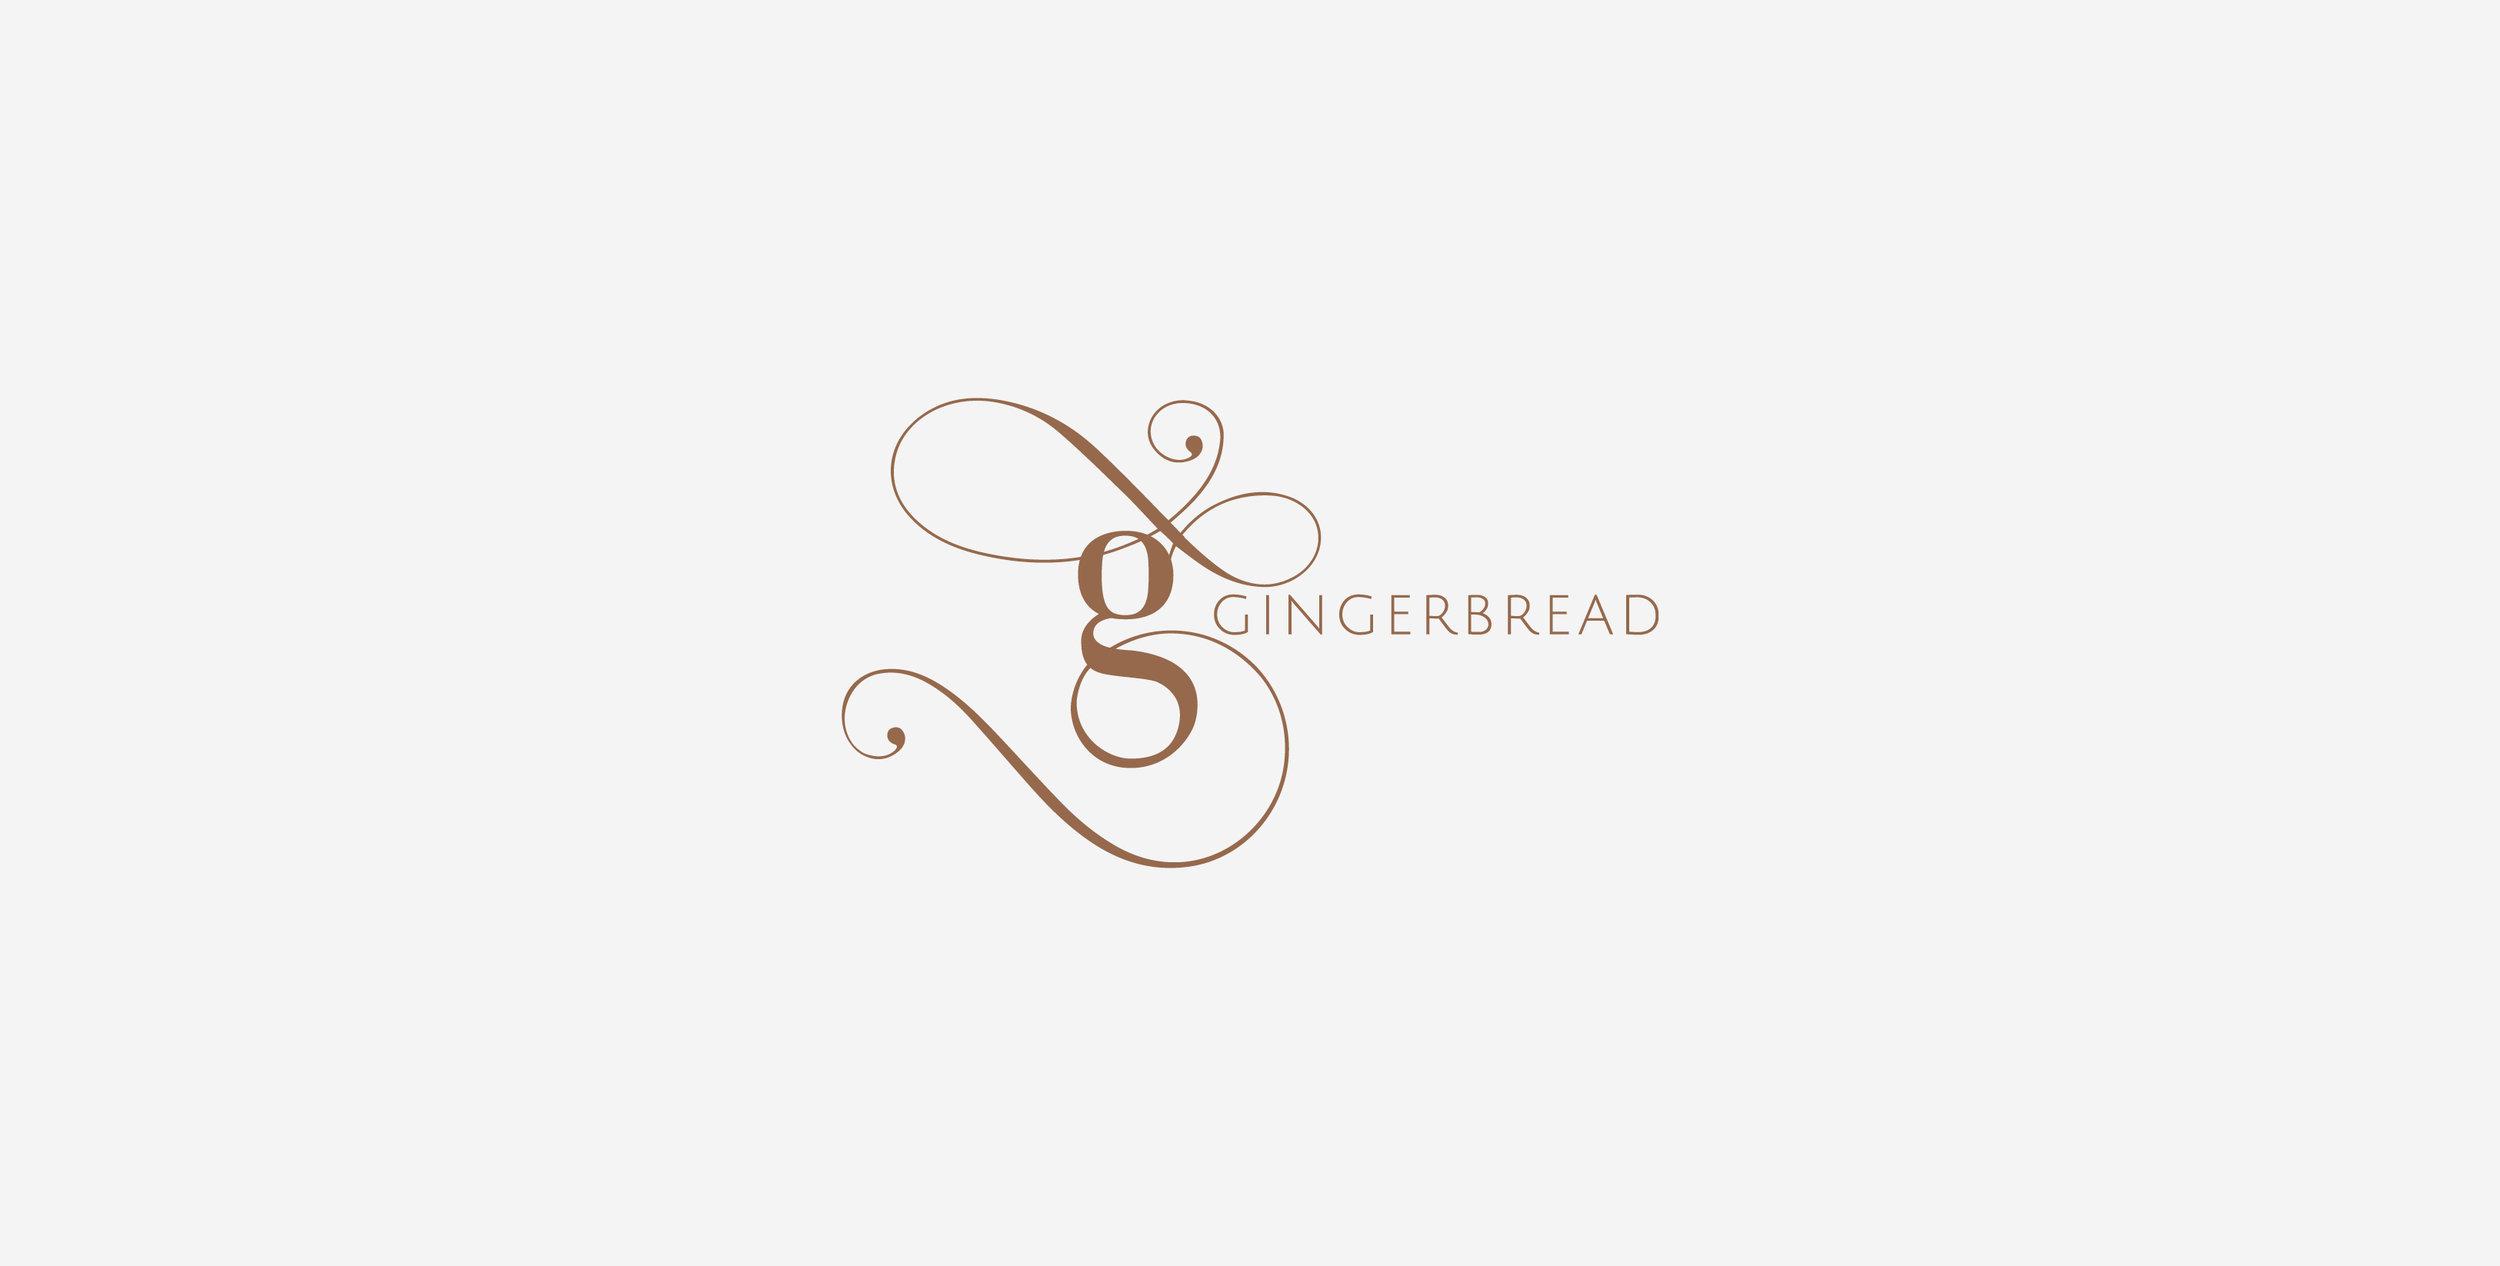 The Apple Yard Gingerbread Interiors